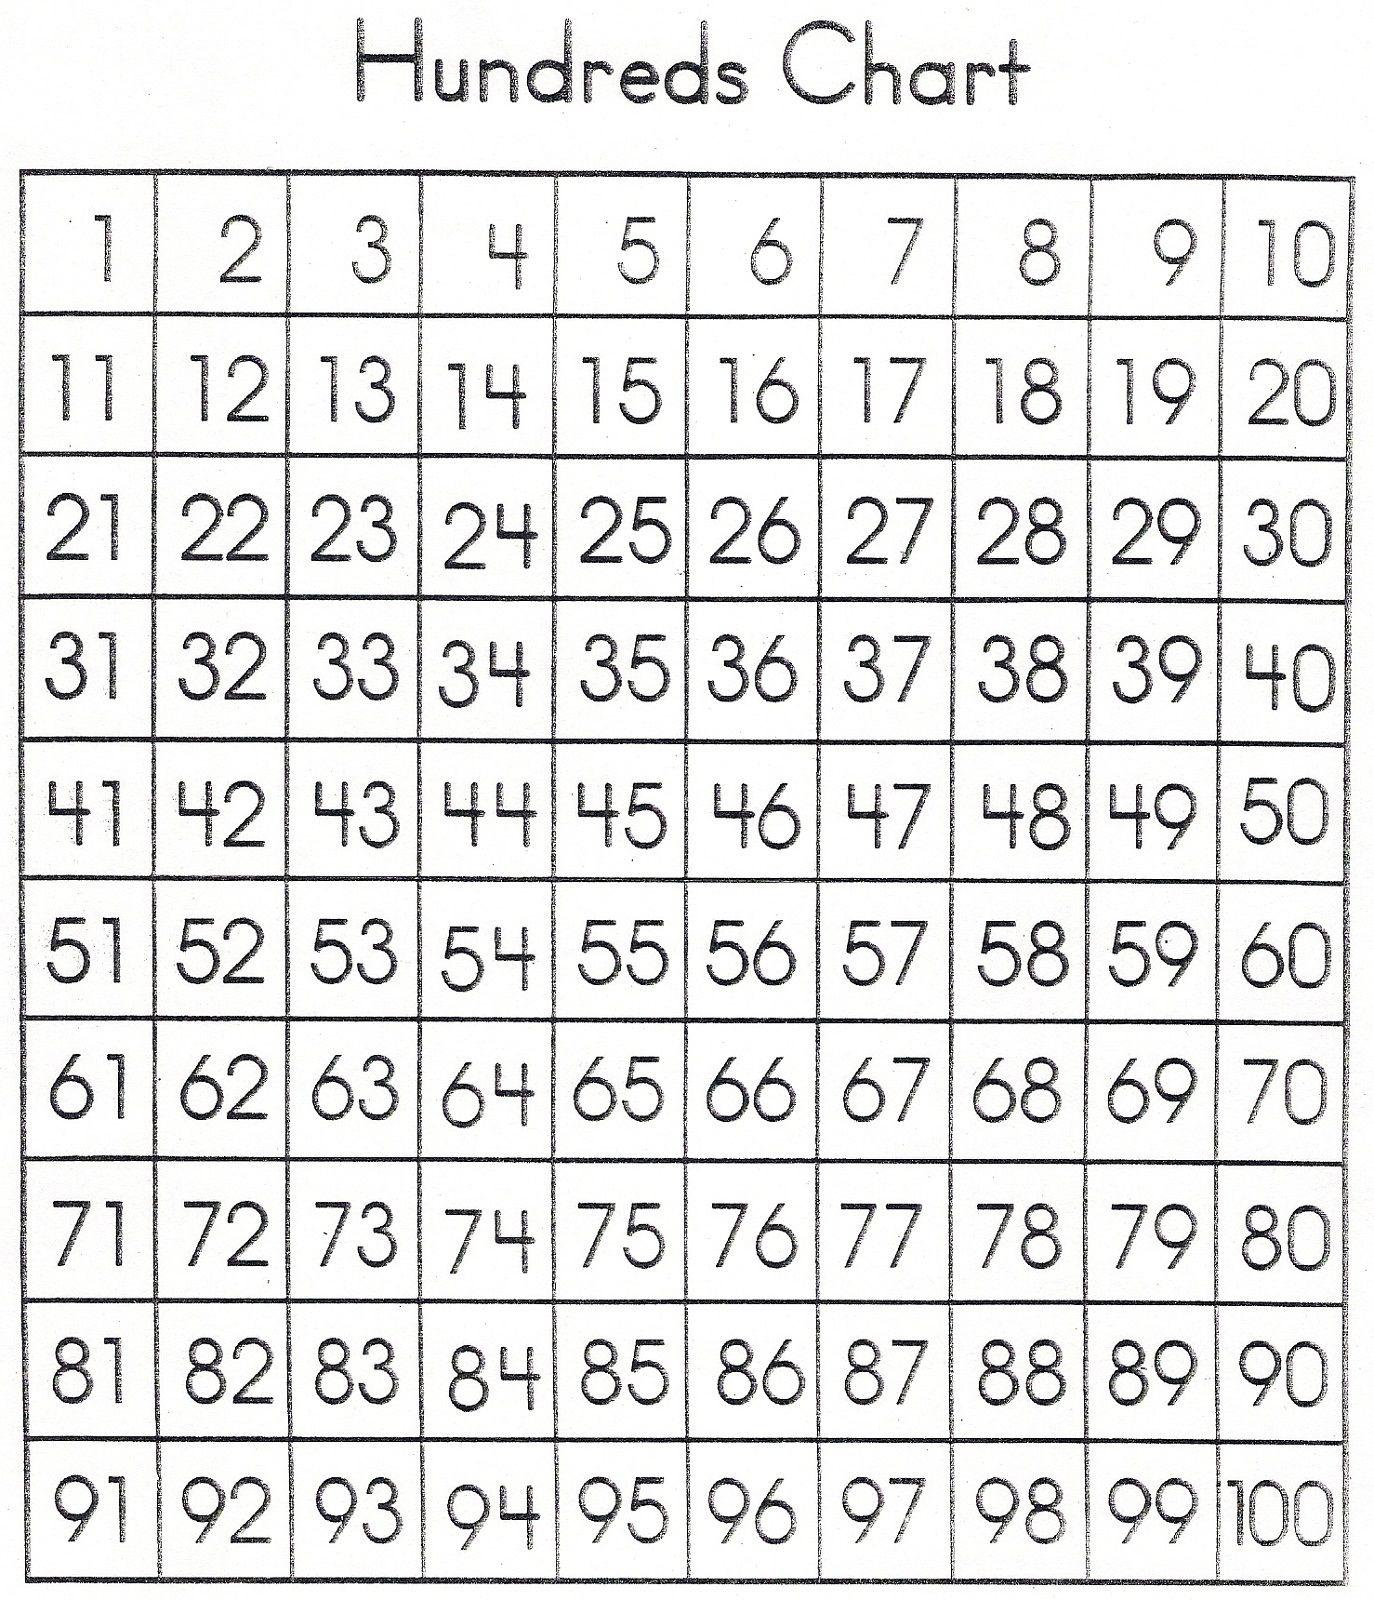 Number Sheet 1-100 To Print | Math Worksheets For Kids | 100 Number - Free Printable Number Worksheets 1 100